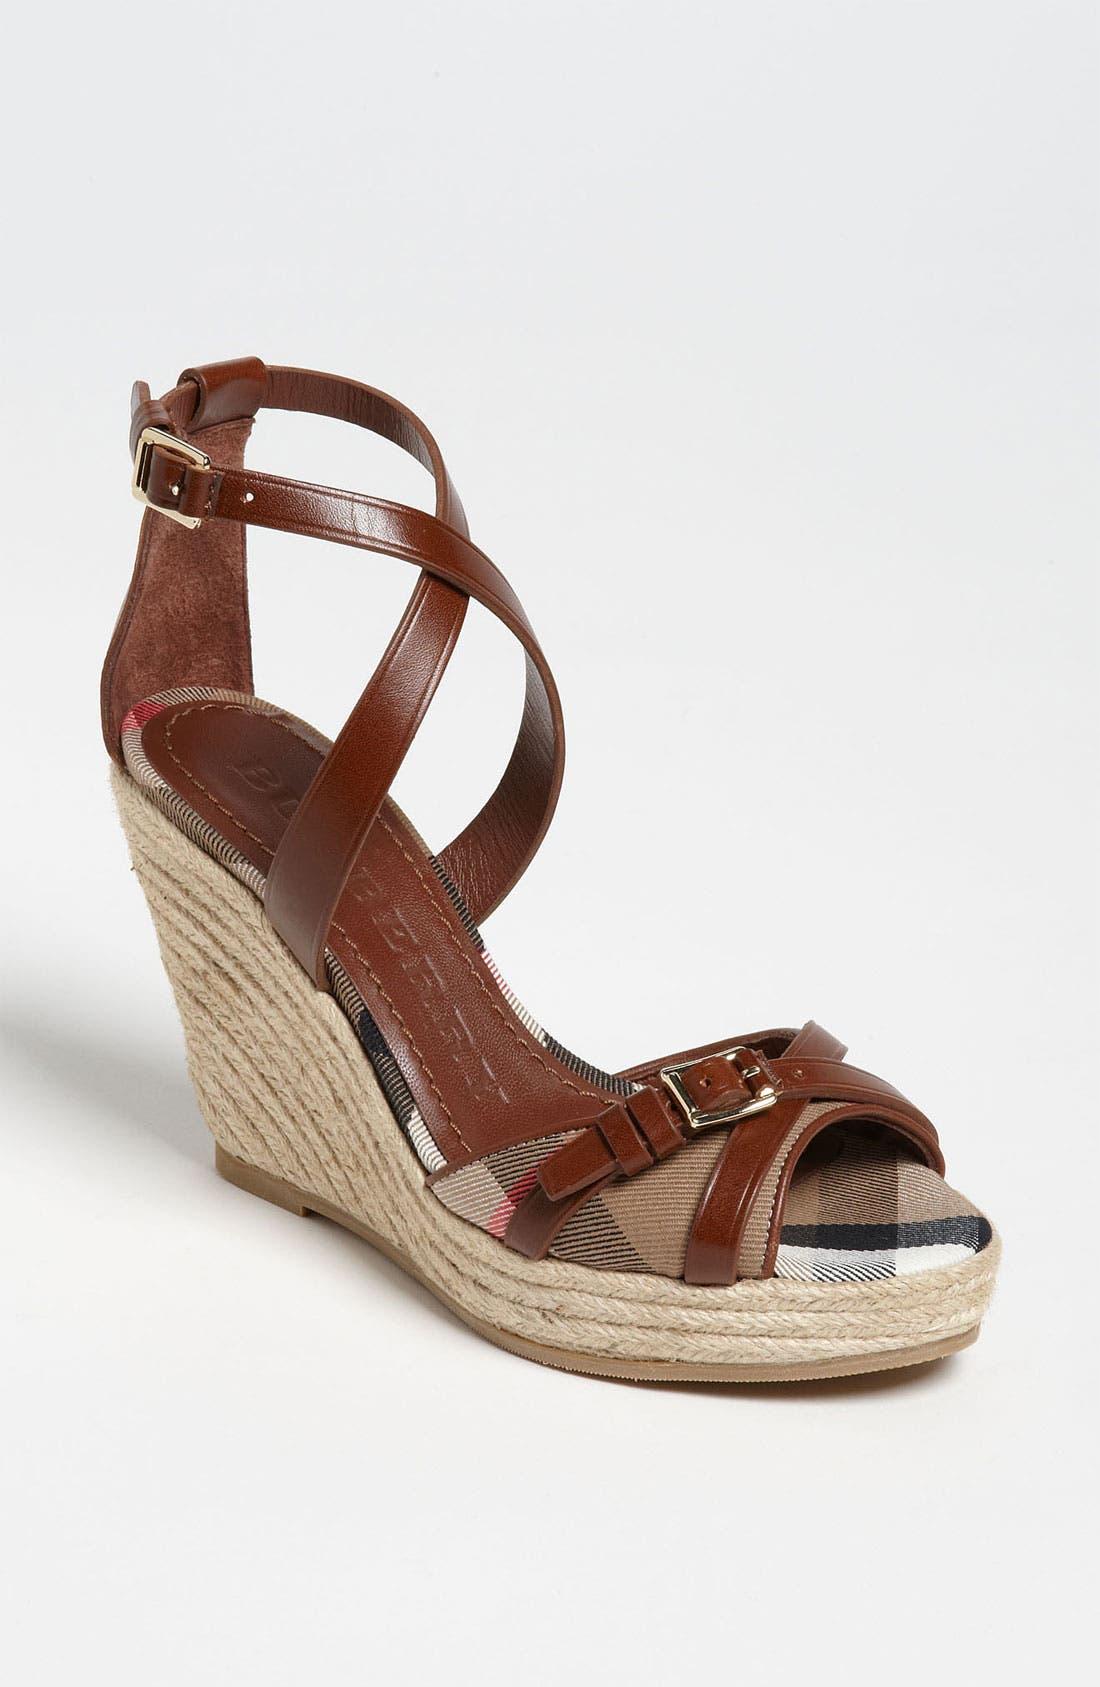 Alternate Image 1 Selected - Burberry 'Walden' Wedge Sandal